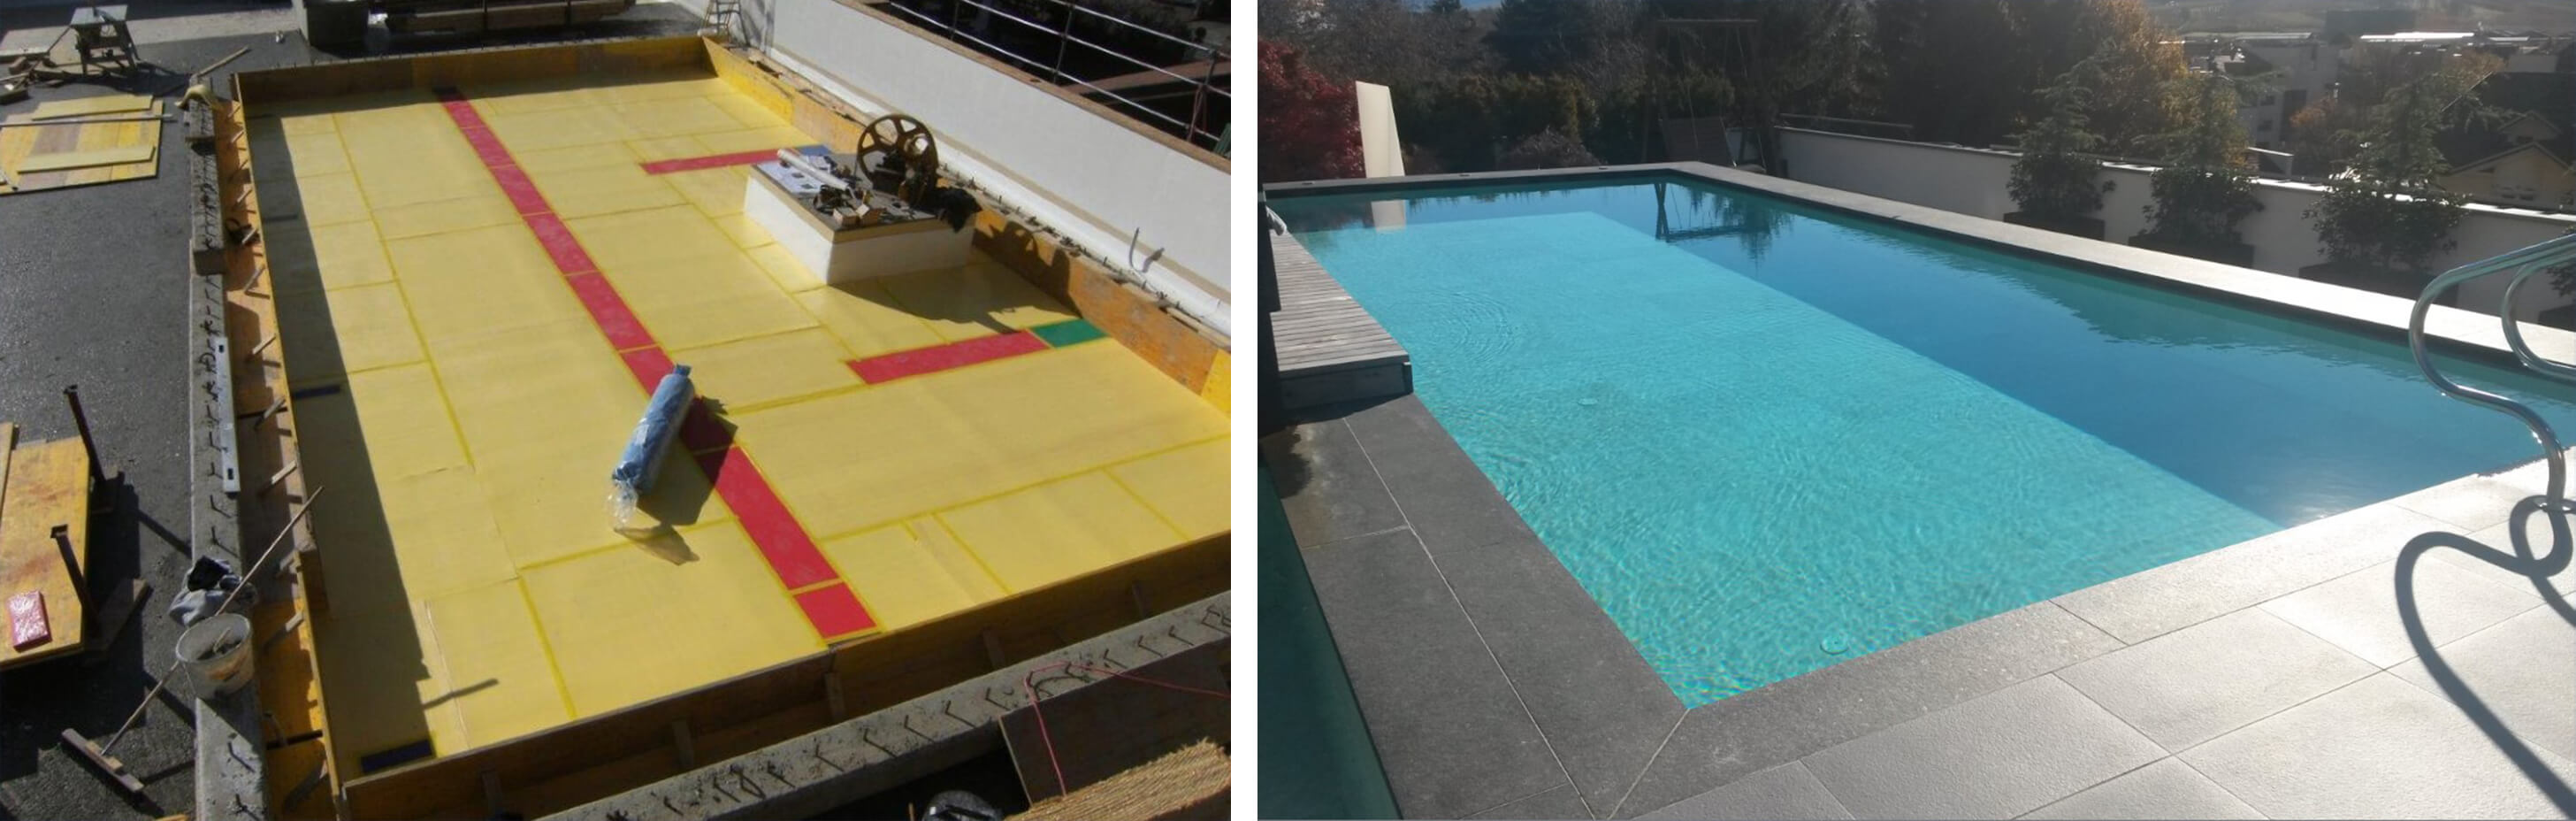 rooftop-pool-insulation-7.jpg